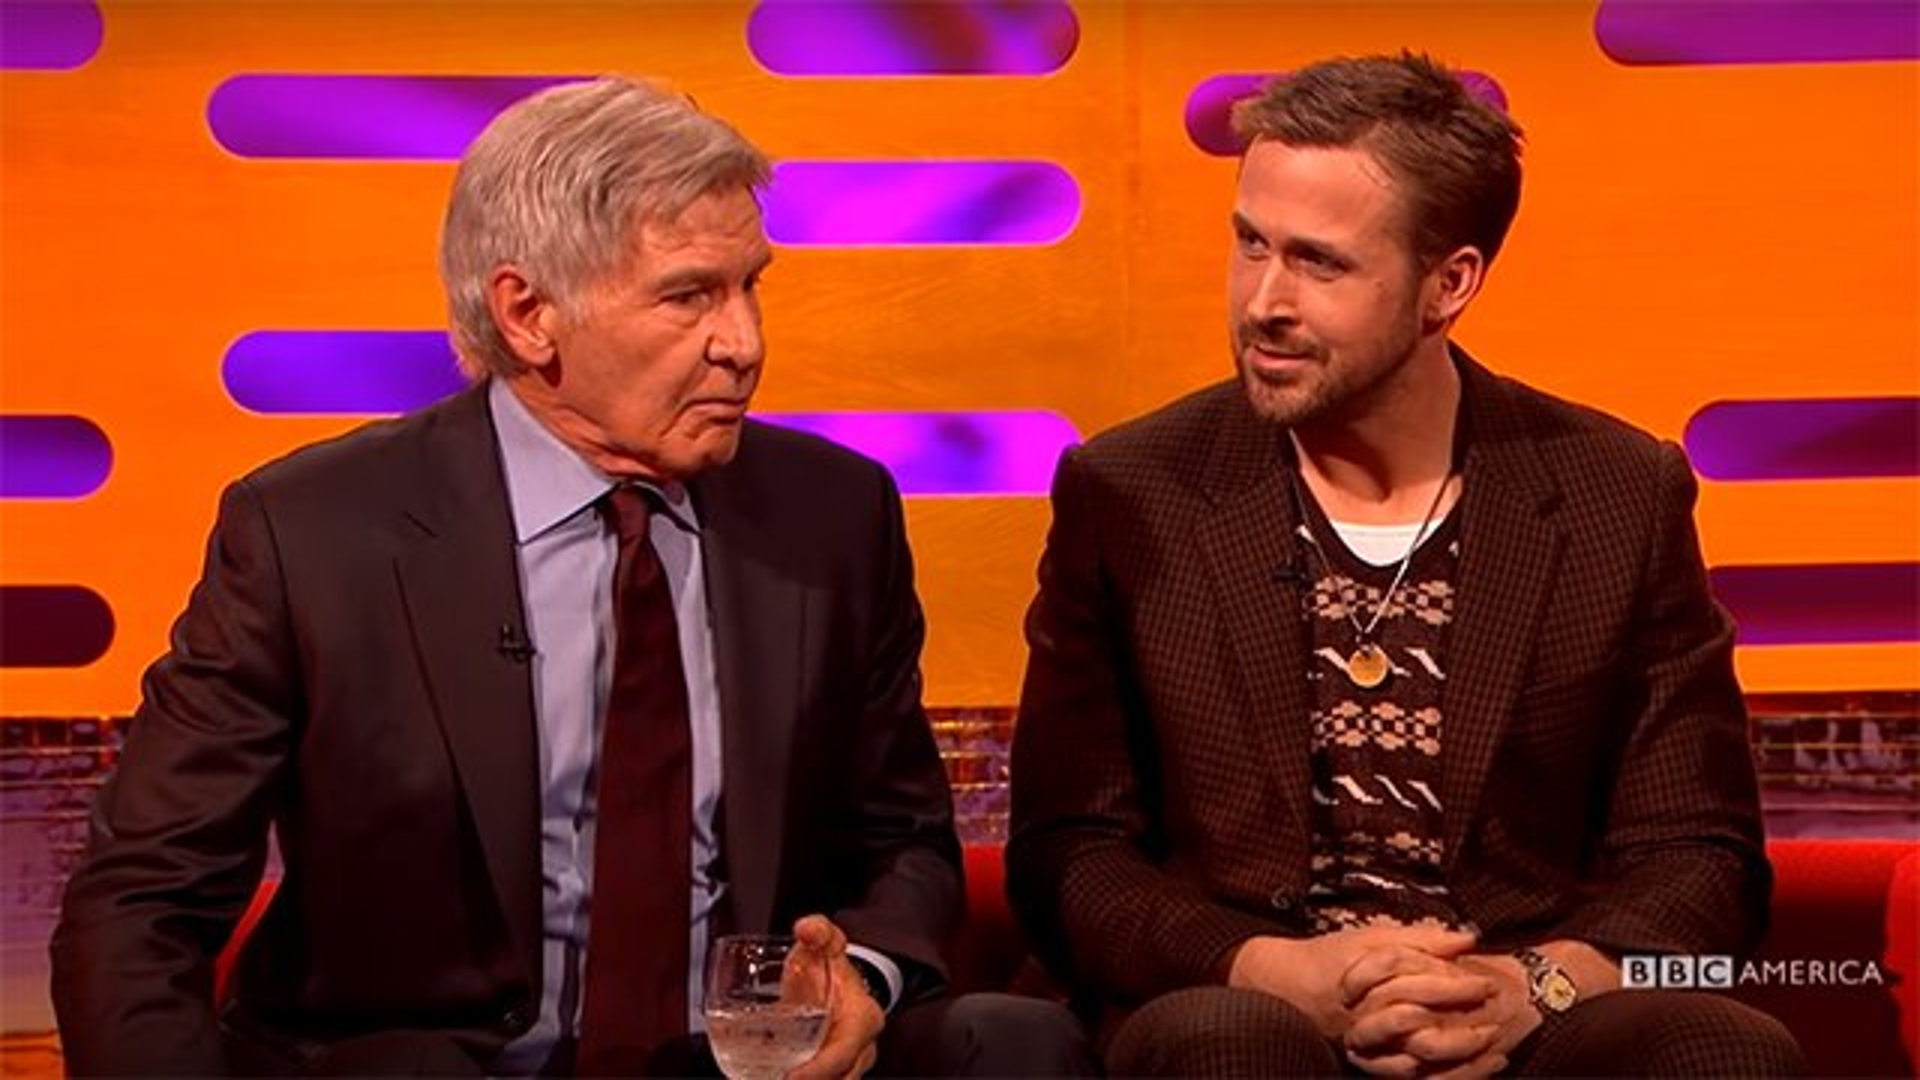 Blade Runner 2049 - Unsere Kritik ist jetzt auch als Text verfügbar